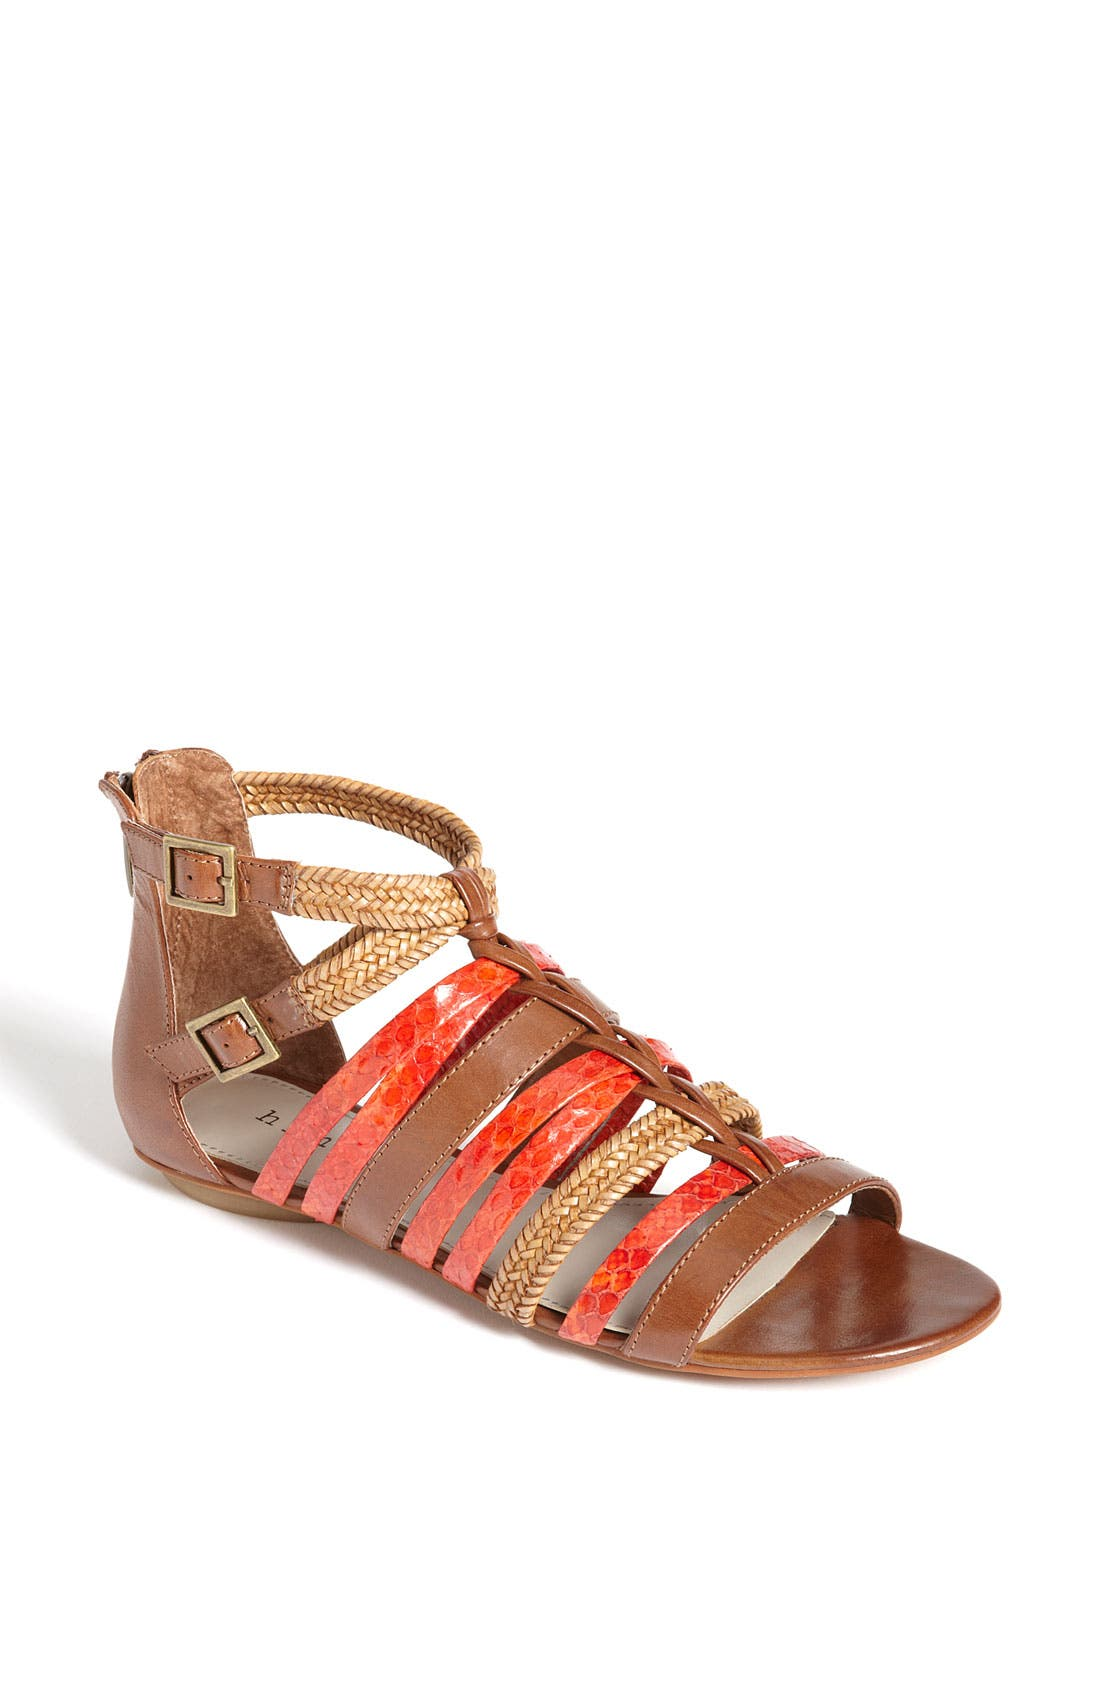 Alternate Image 1 Selected - Hinge® 'Tanner' Sandal